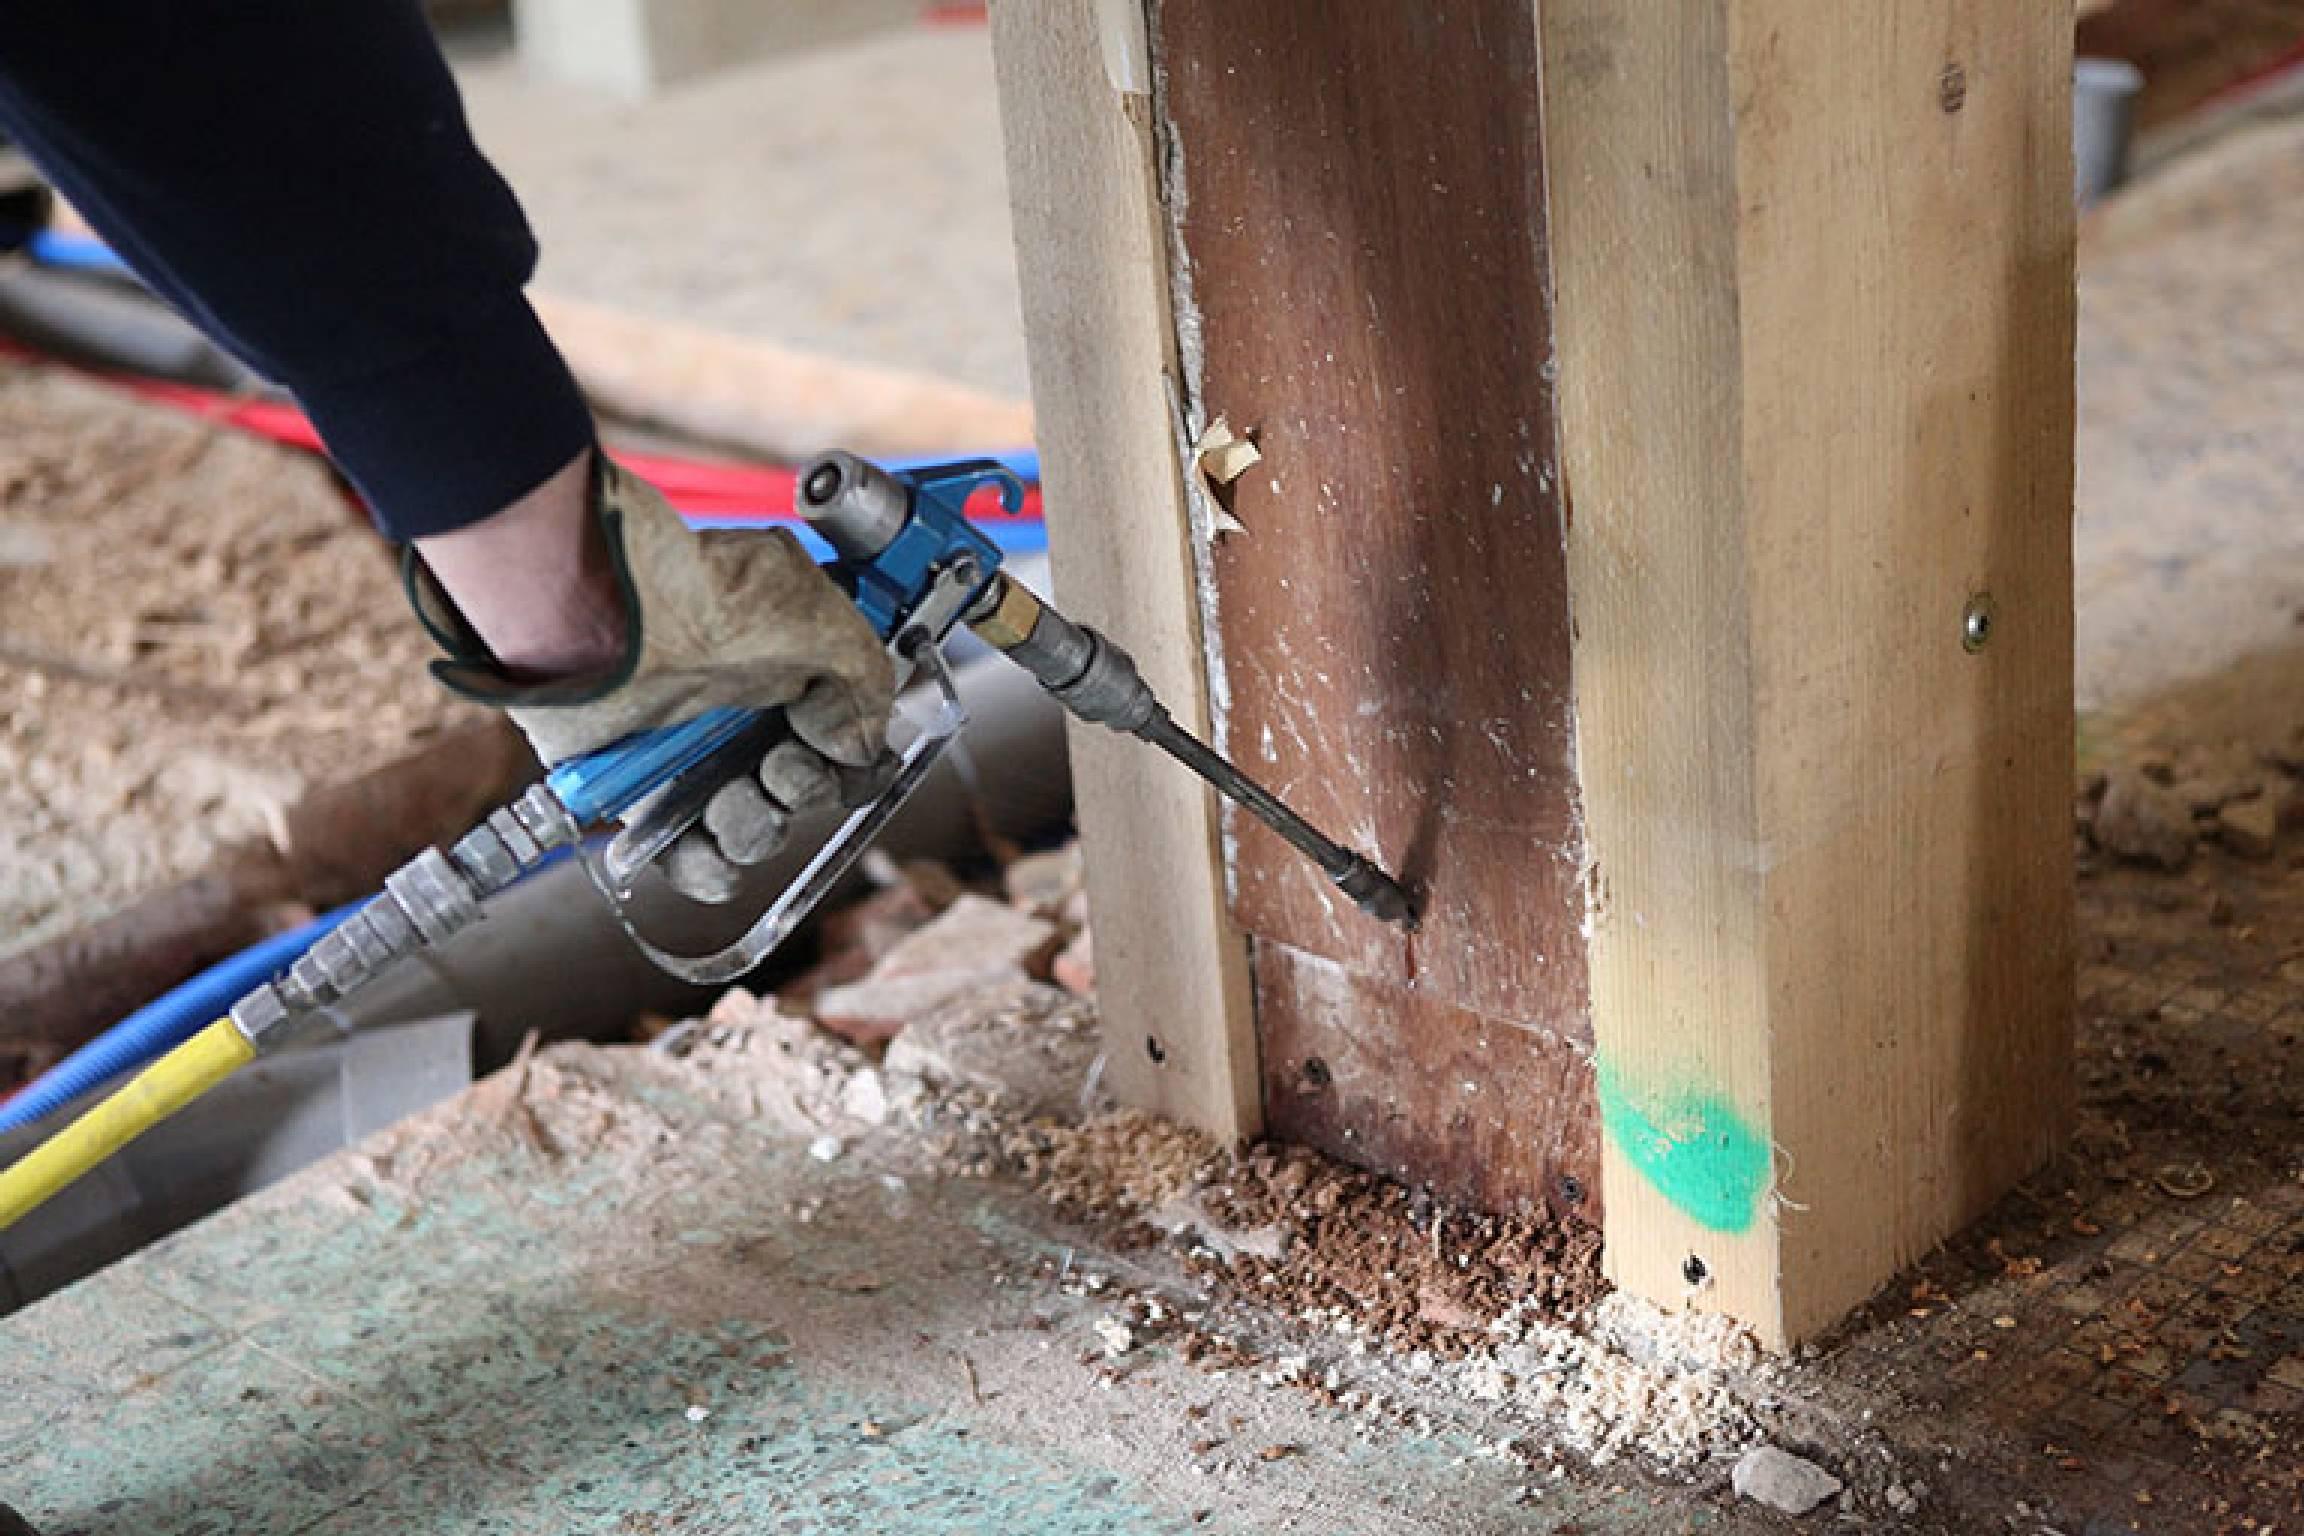 Subterranean Termite Treatment Options